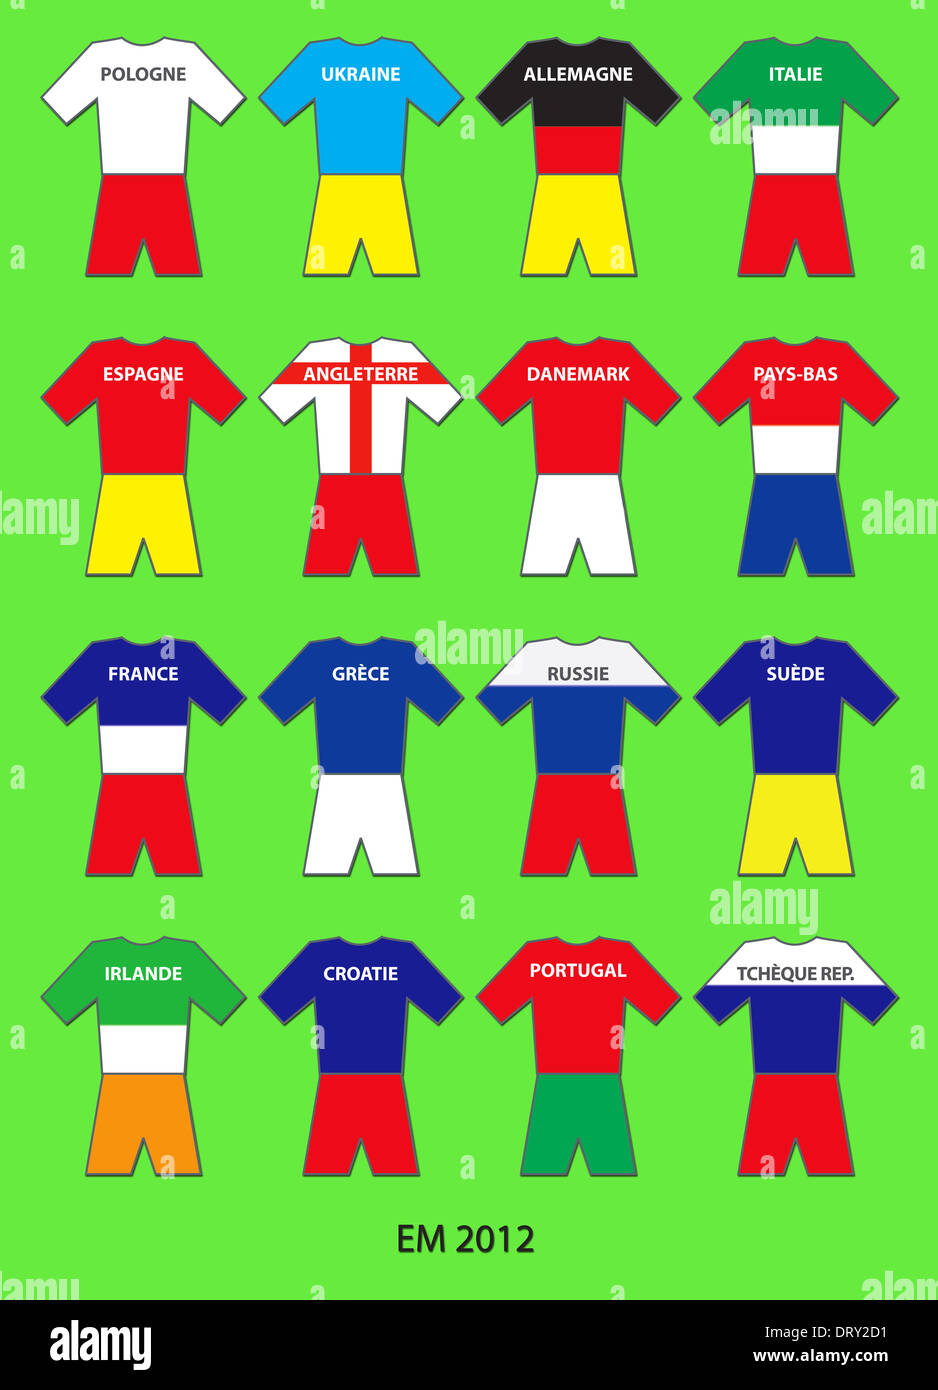 EM 2012 Equipes - English Photo Stock